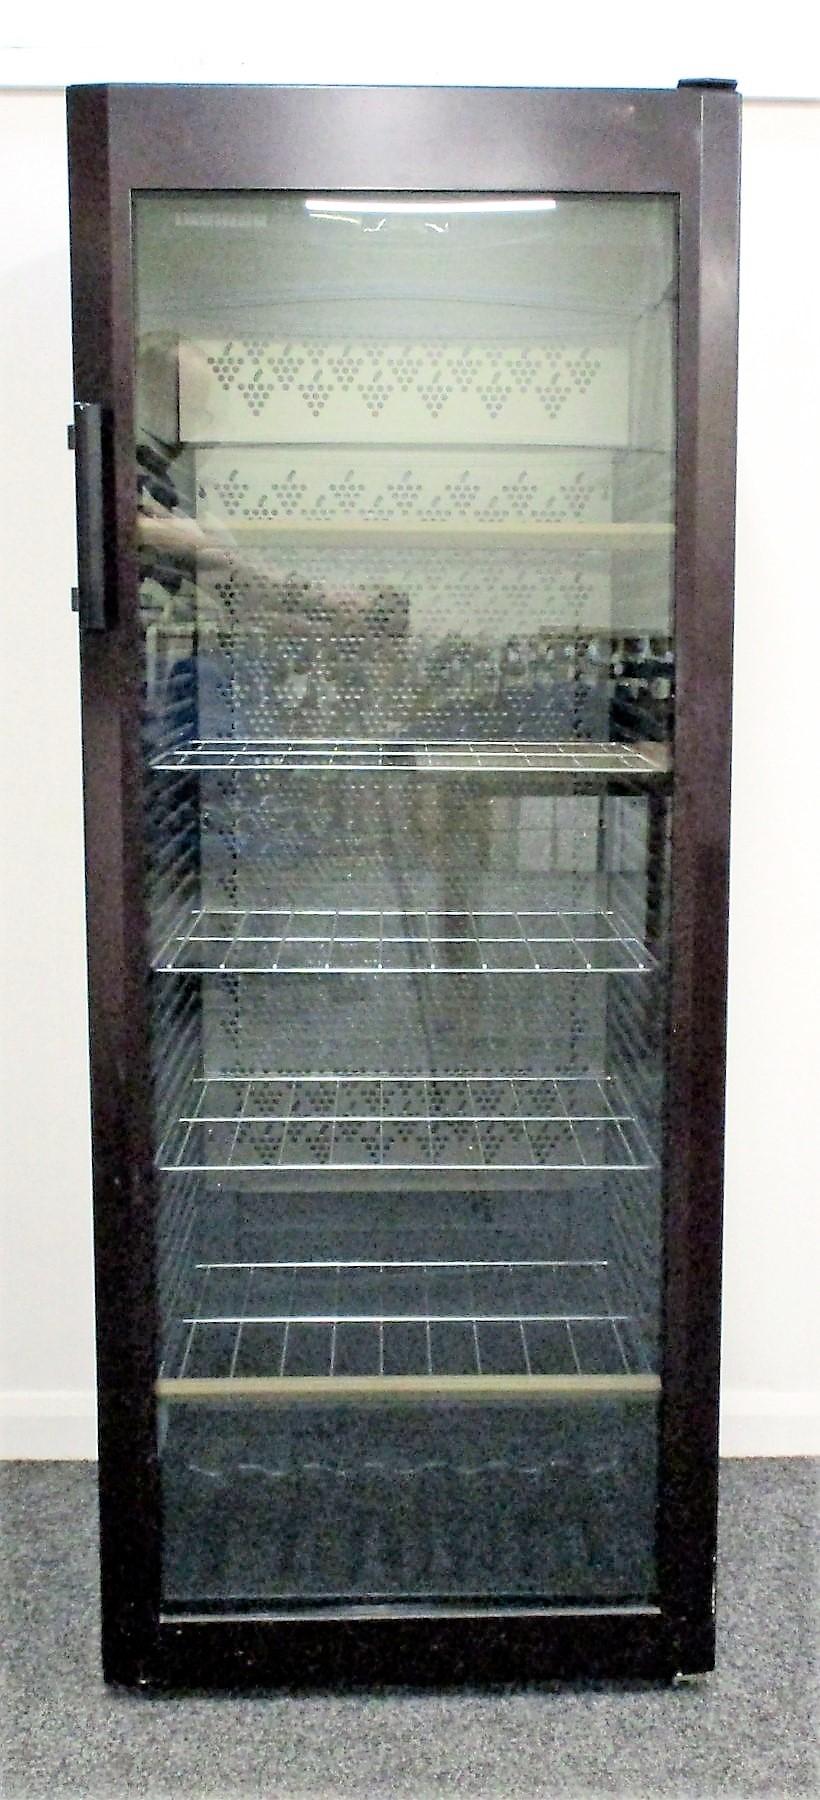 A Liebherr Vinotech WK 4127 Freestanding Wine Storage Fridge Bordeaux Red with Tinted Glass door